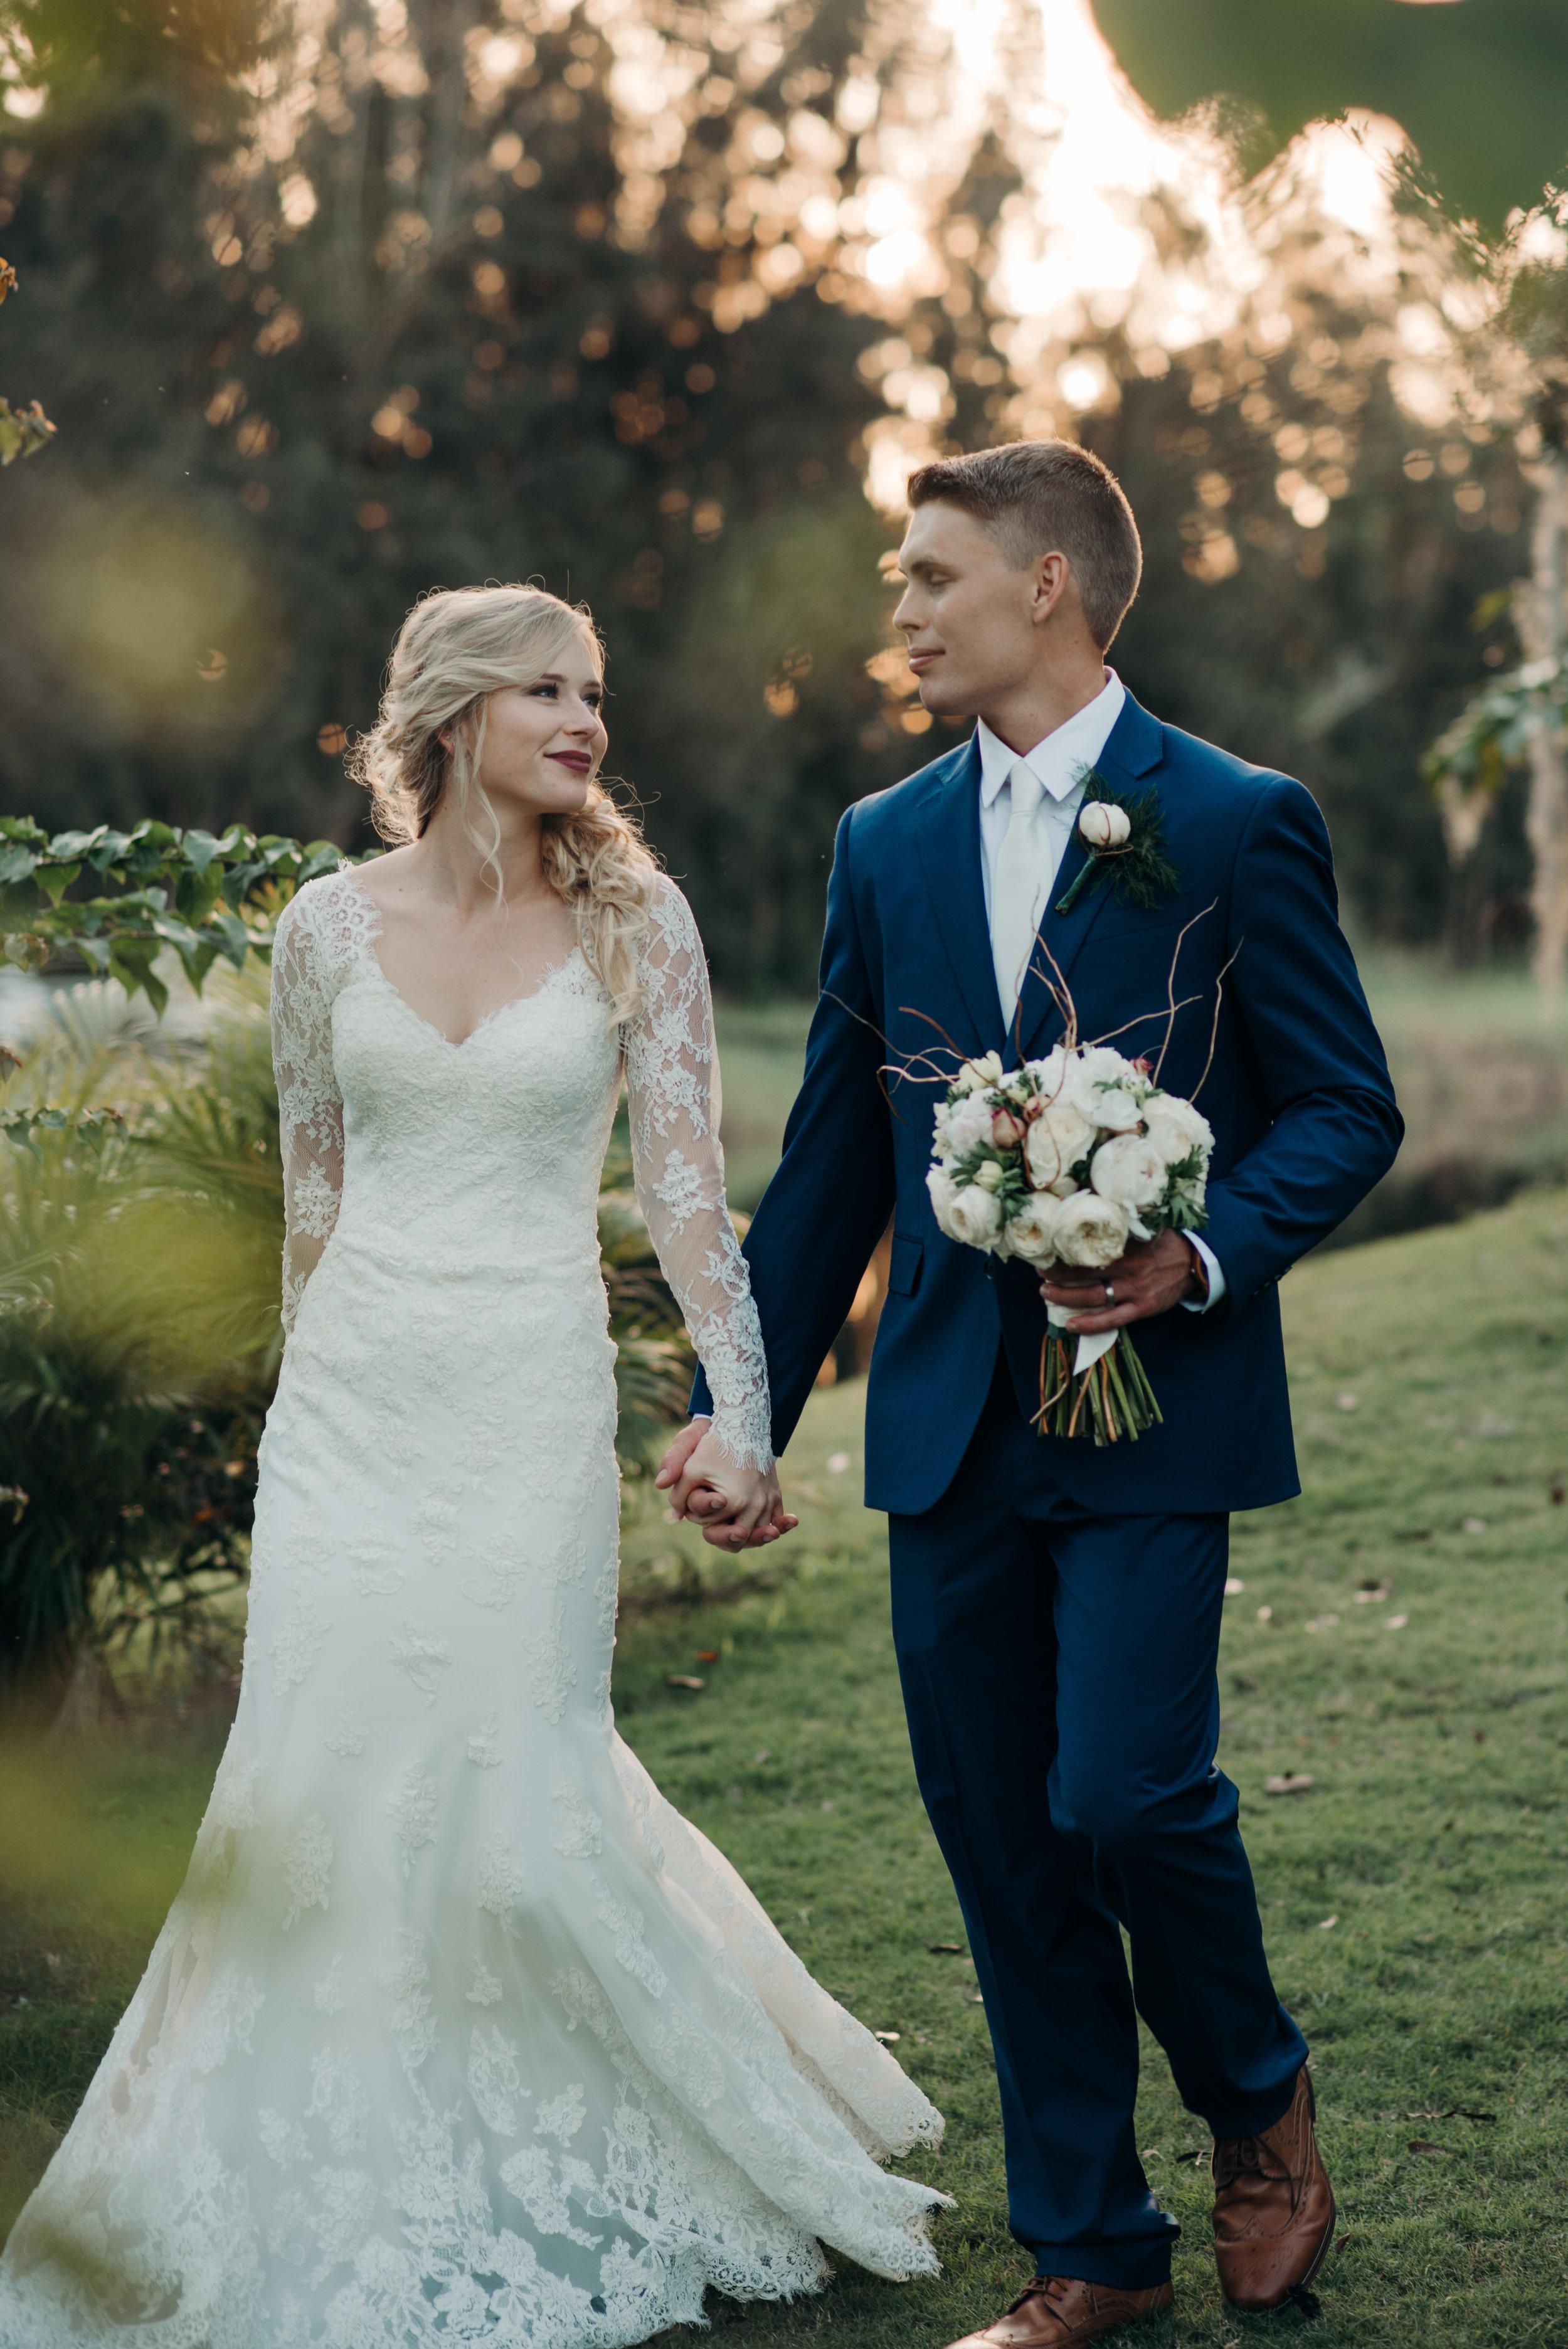 micayla-greyson-neumann-vero-beach-lake-house-winter-white-wedding-photography-849.jpg